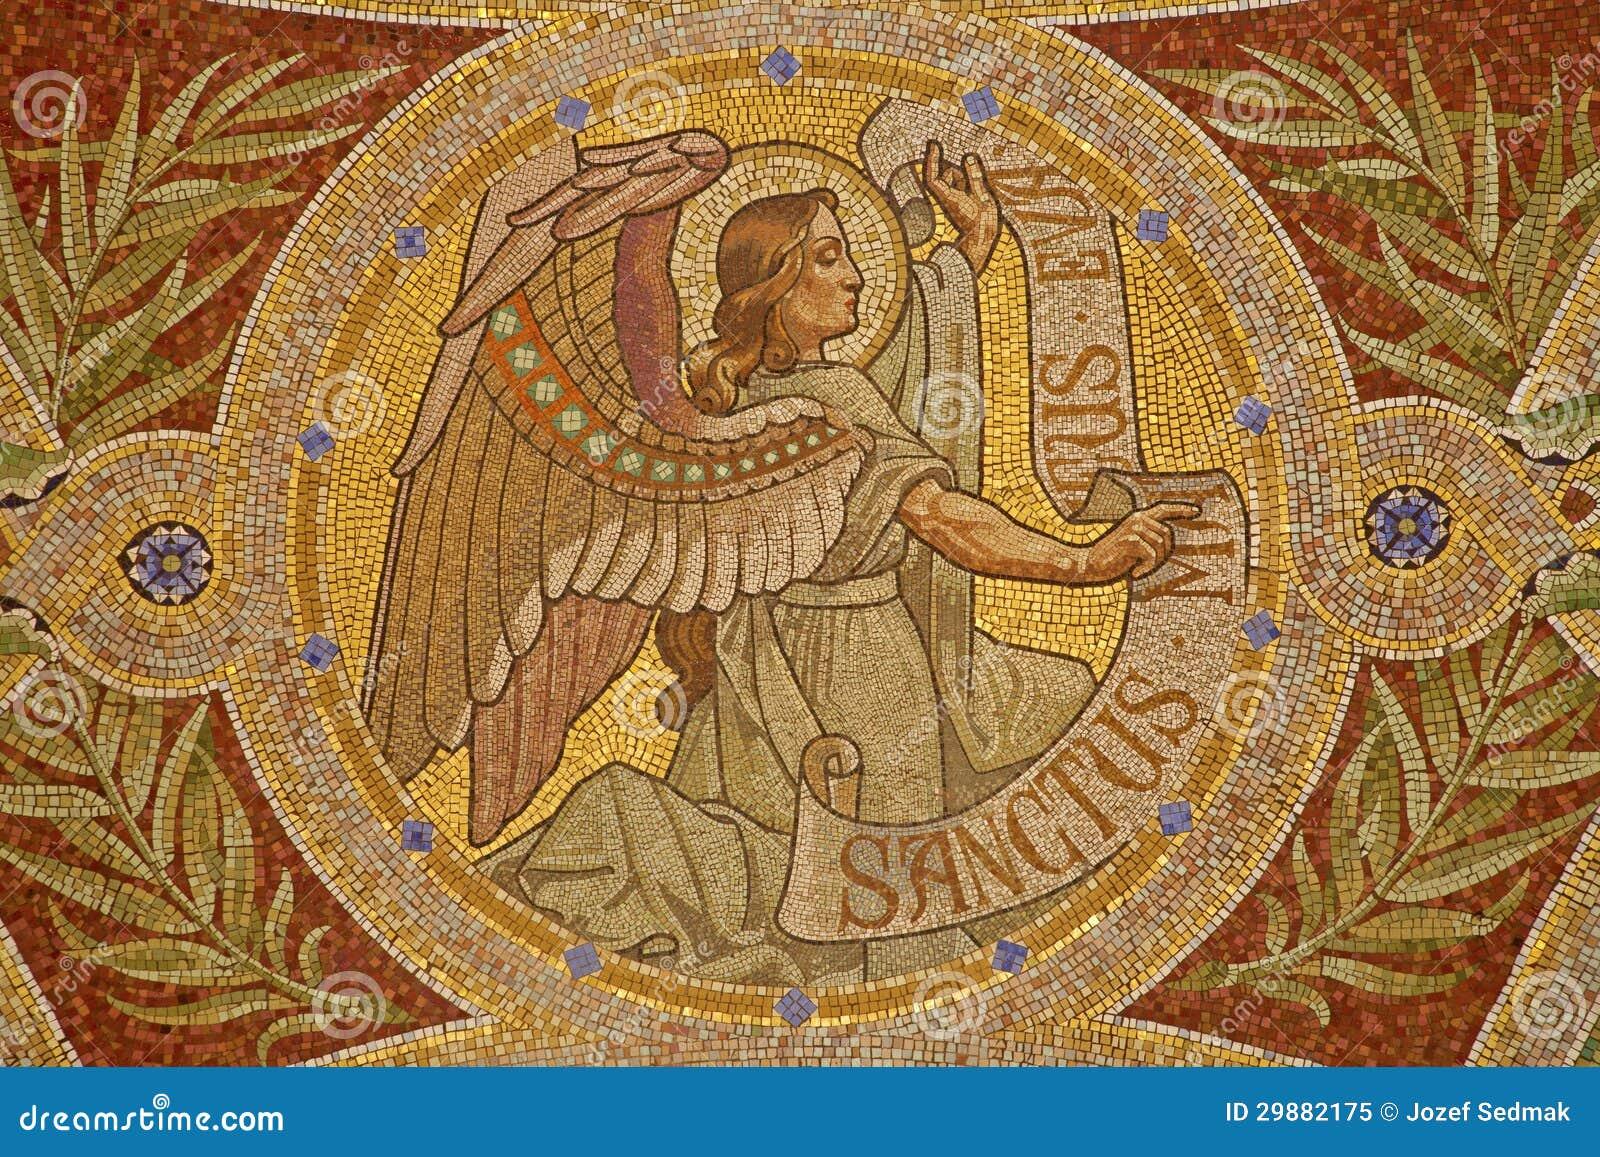 Madrid Mosaic Of Angel As Symbol Of Saint Matthew The Evangelist